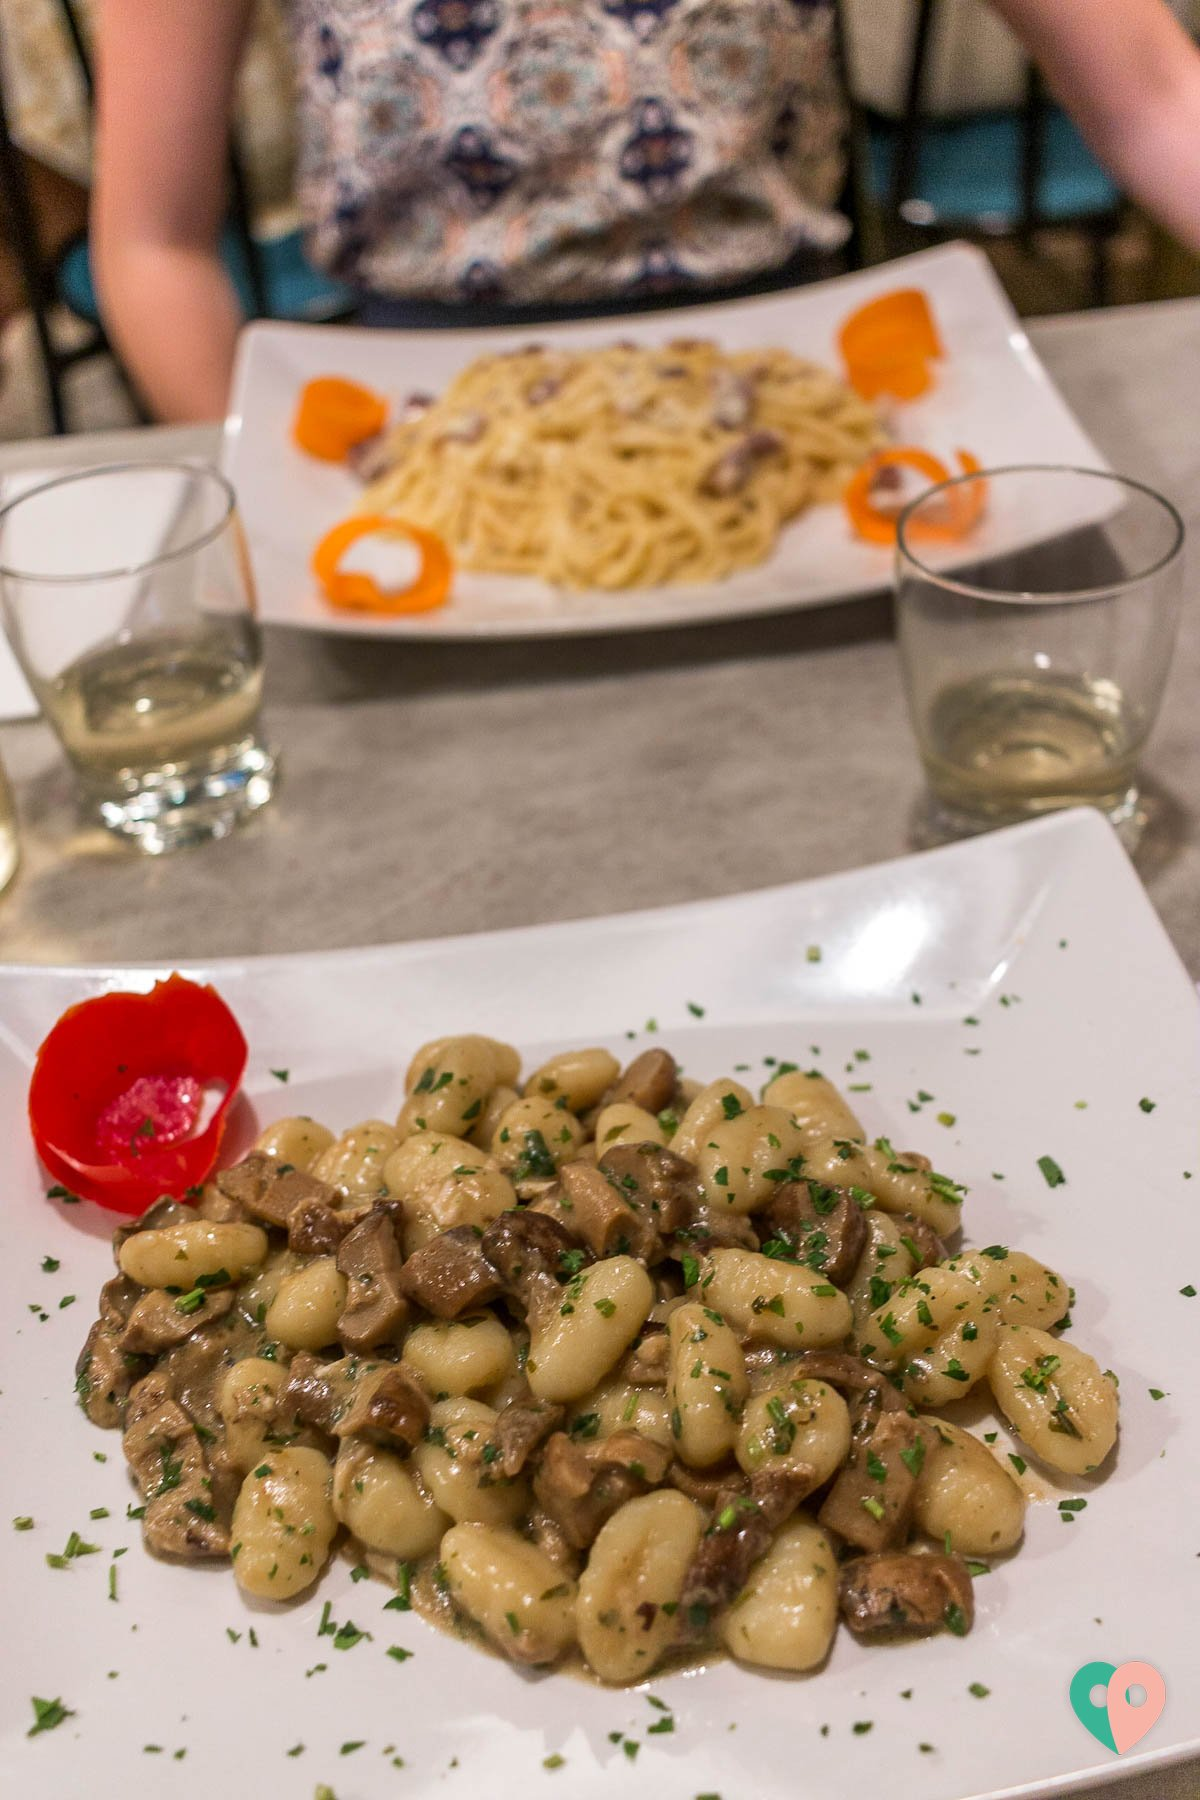 Florenz Foodguide - Ristorante Pizzeria Stadio